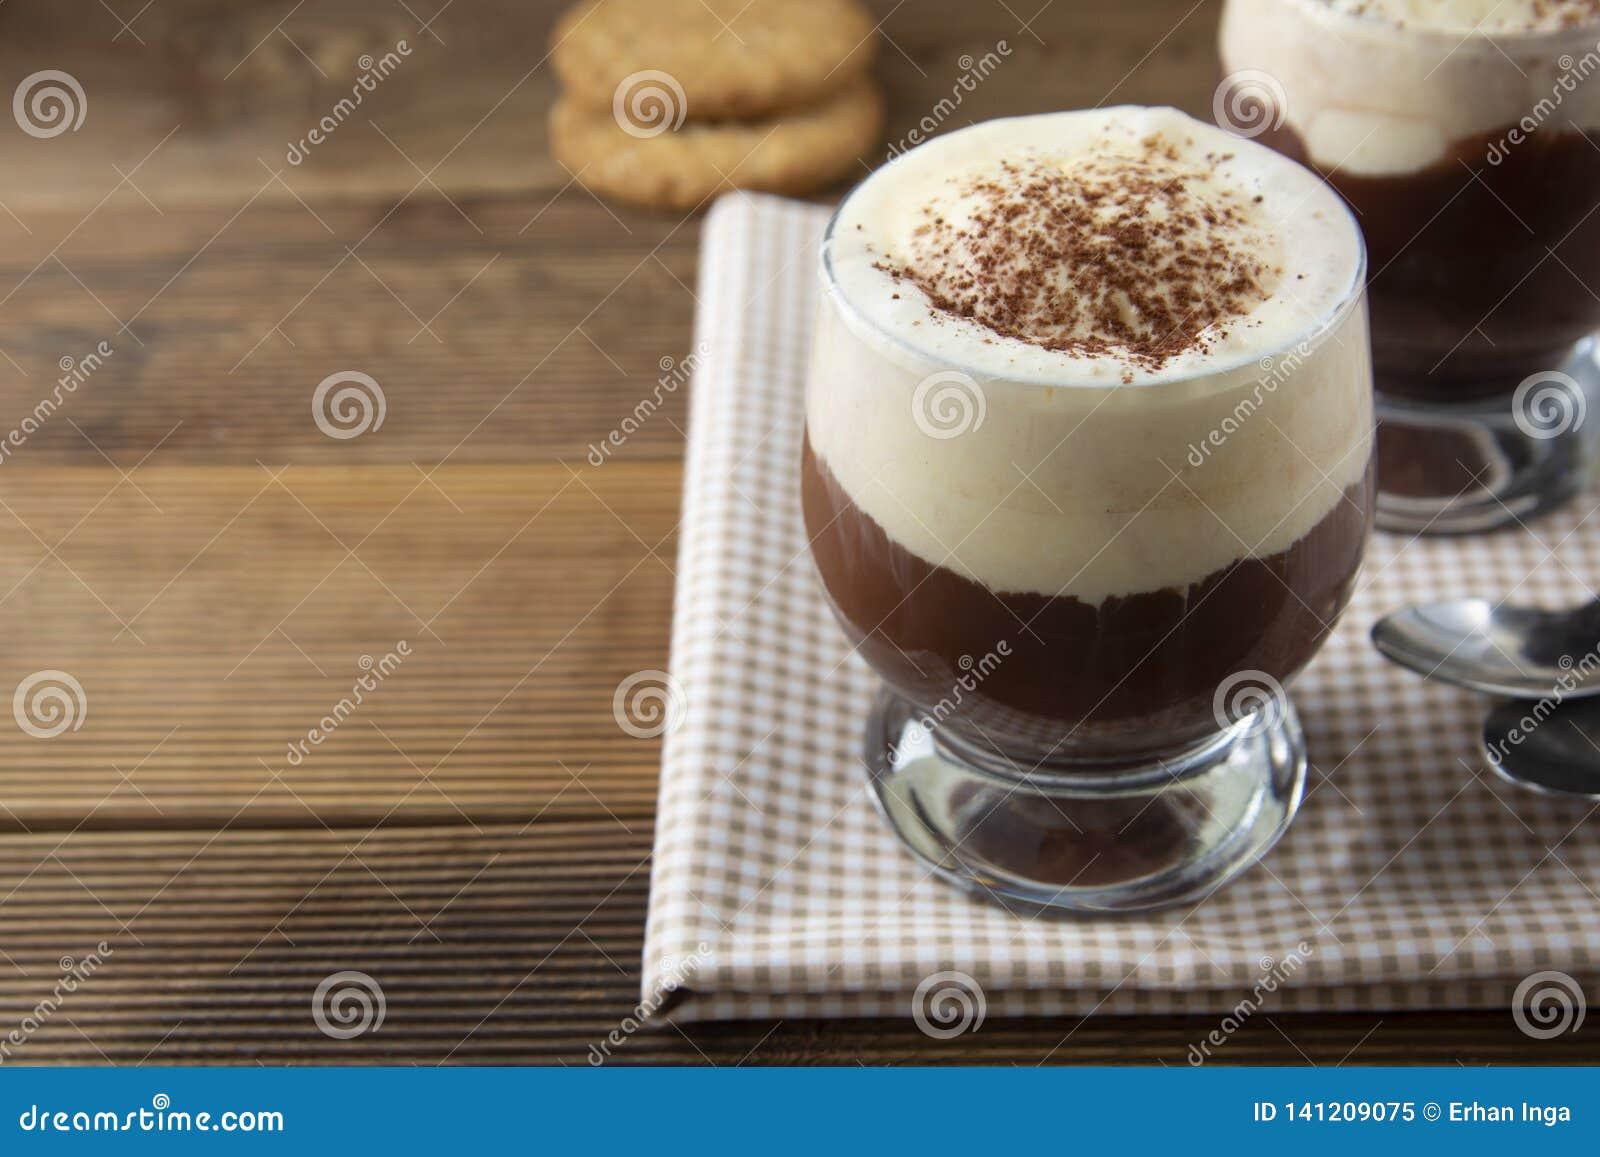 Coffee affogato with vanilla ice cream and espresso. Glass with coffee drink and icecream